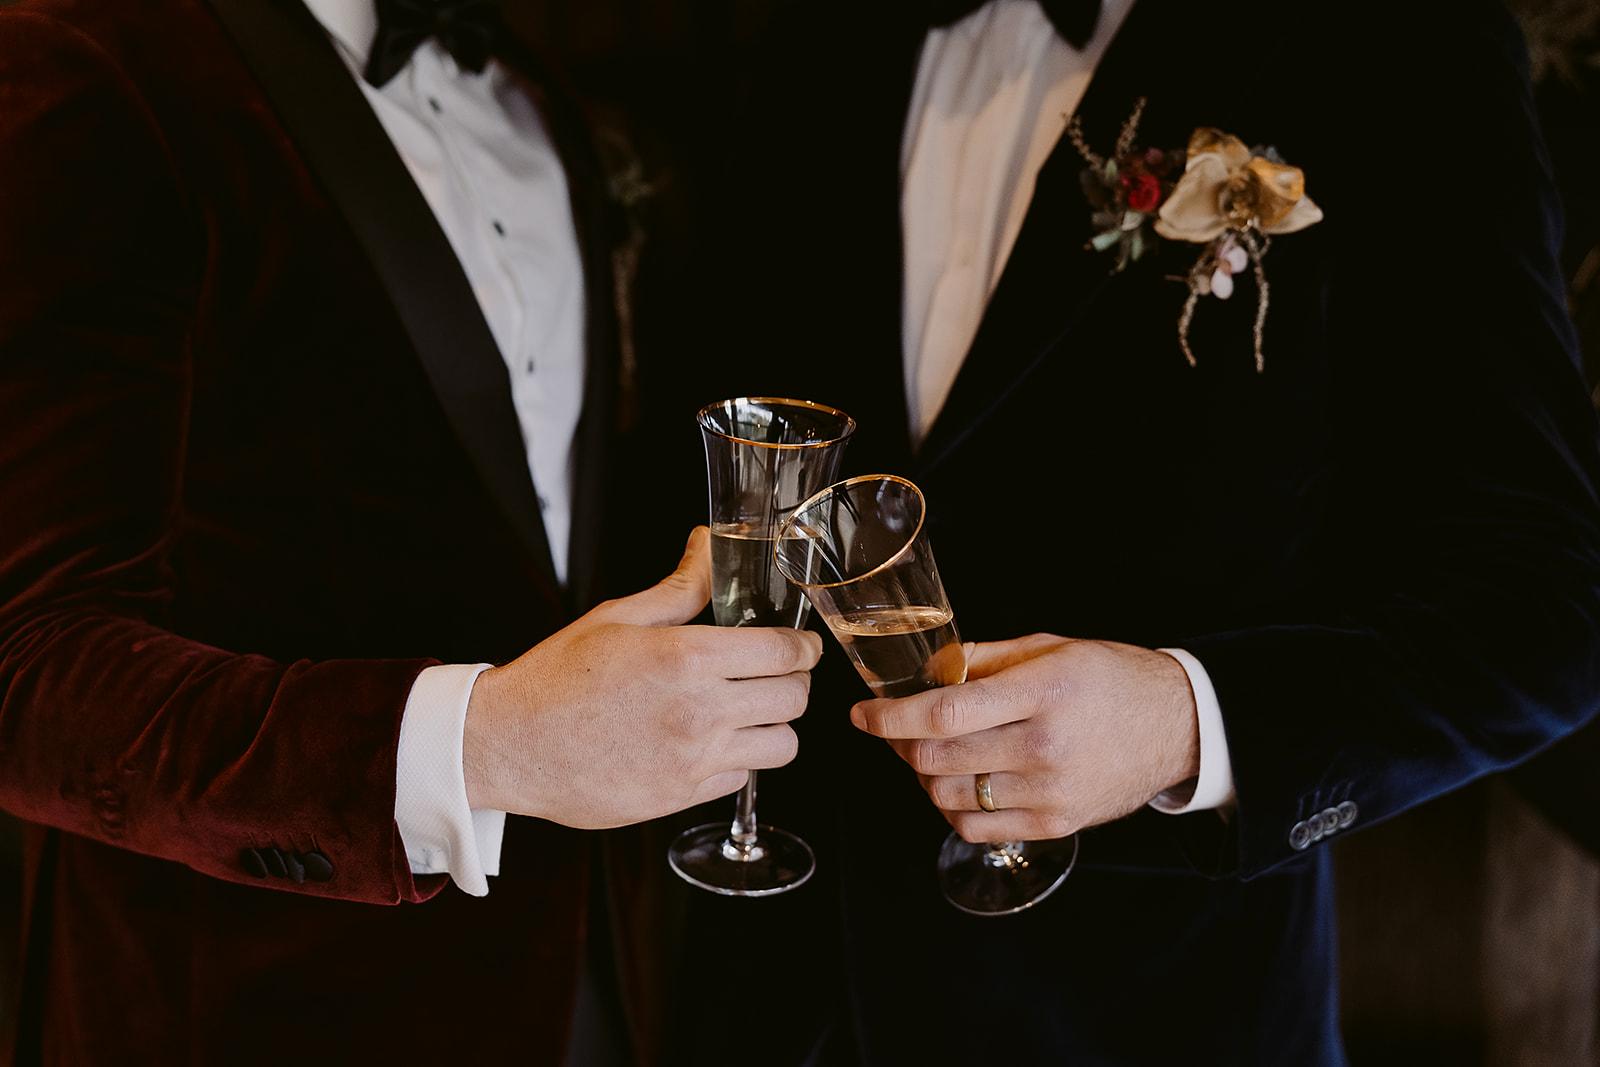 Immerse_Yarra_Valley_Same_Sex_Wedding_-_Ashleigh_Haase_Photography-612.jpg